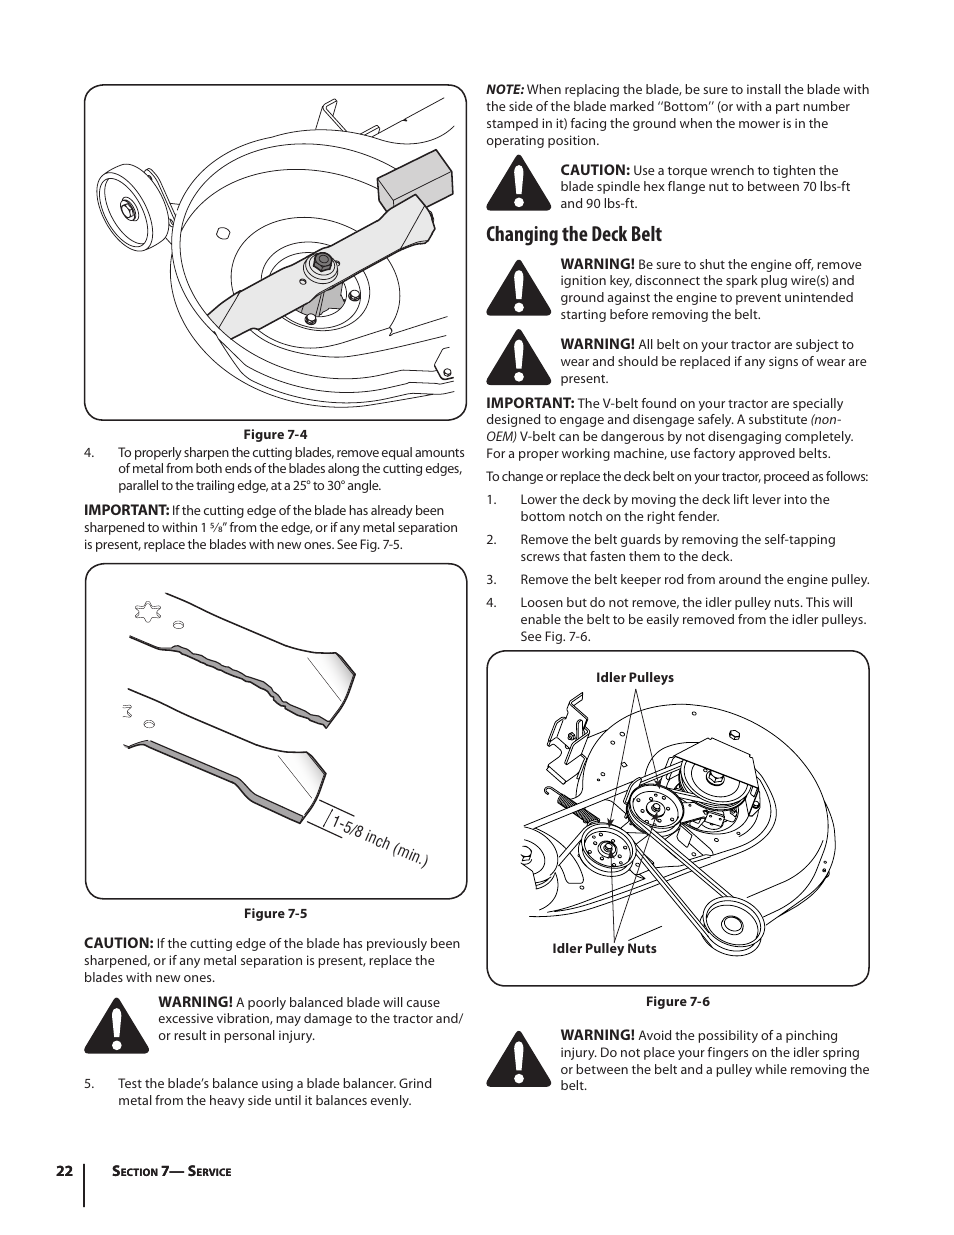 Changing the deck belt | Troy-Bilt Pony User Manual | Page